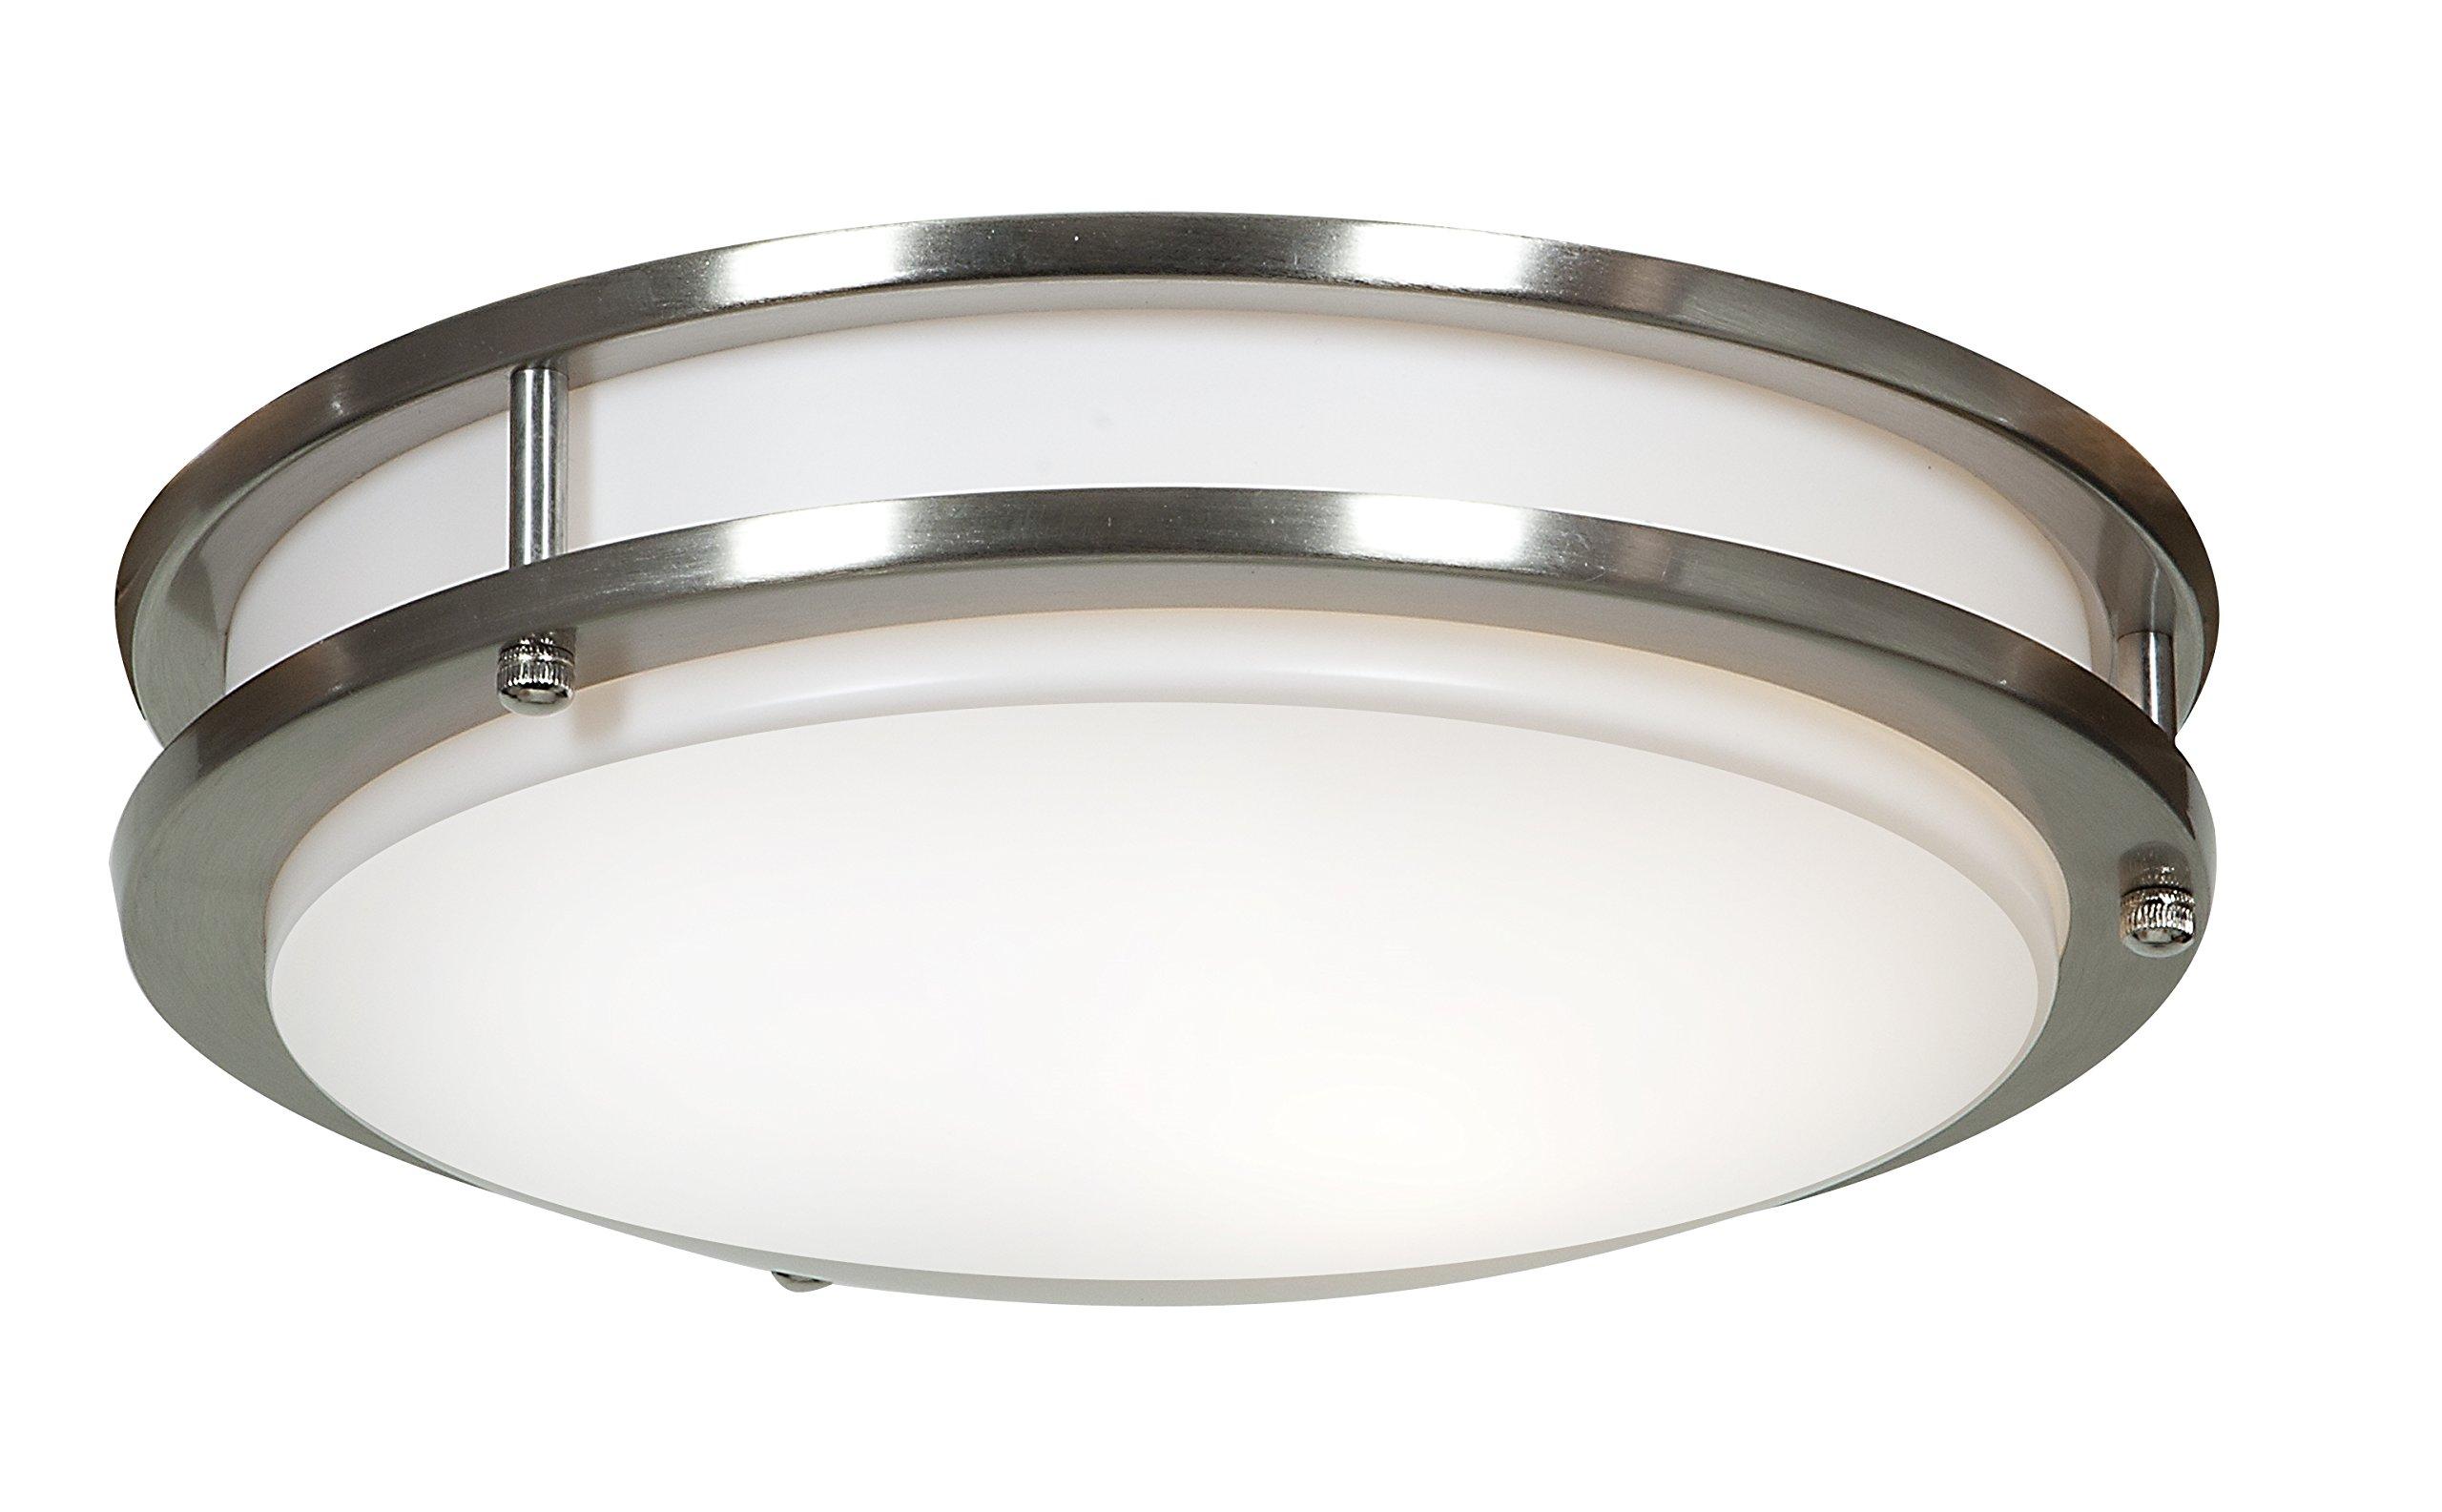 Solero Flush Mount - LED - 12''D - Brushed Steel Finish - Acrylic Lens Diffuser